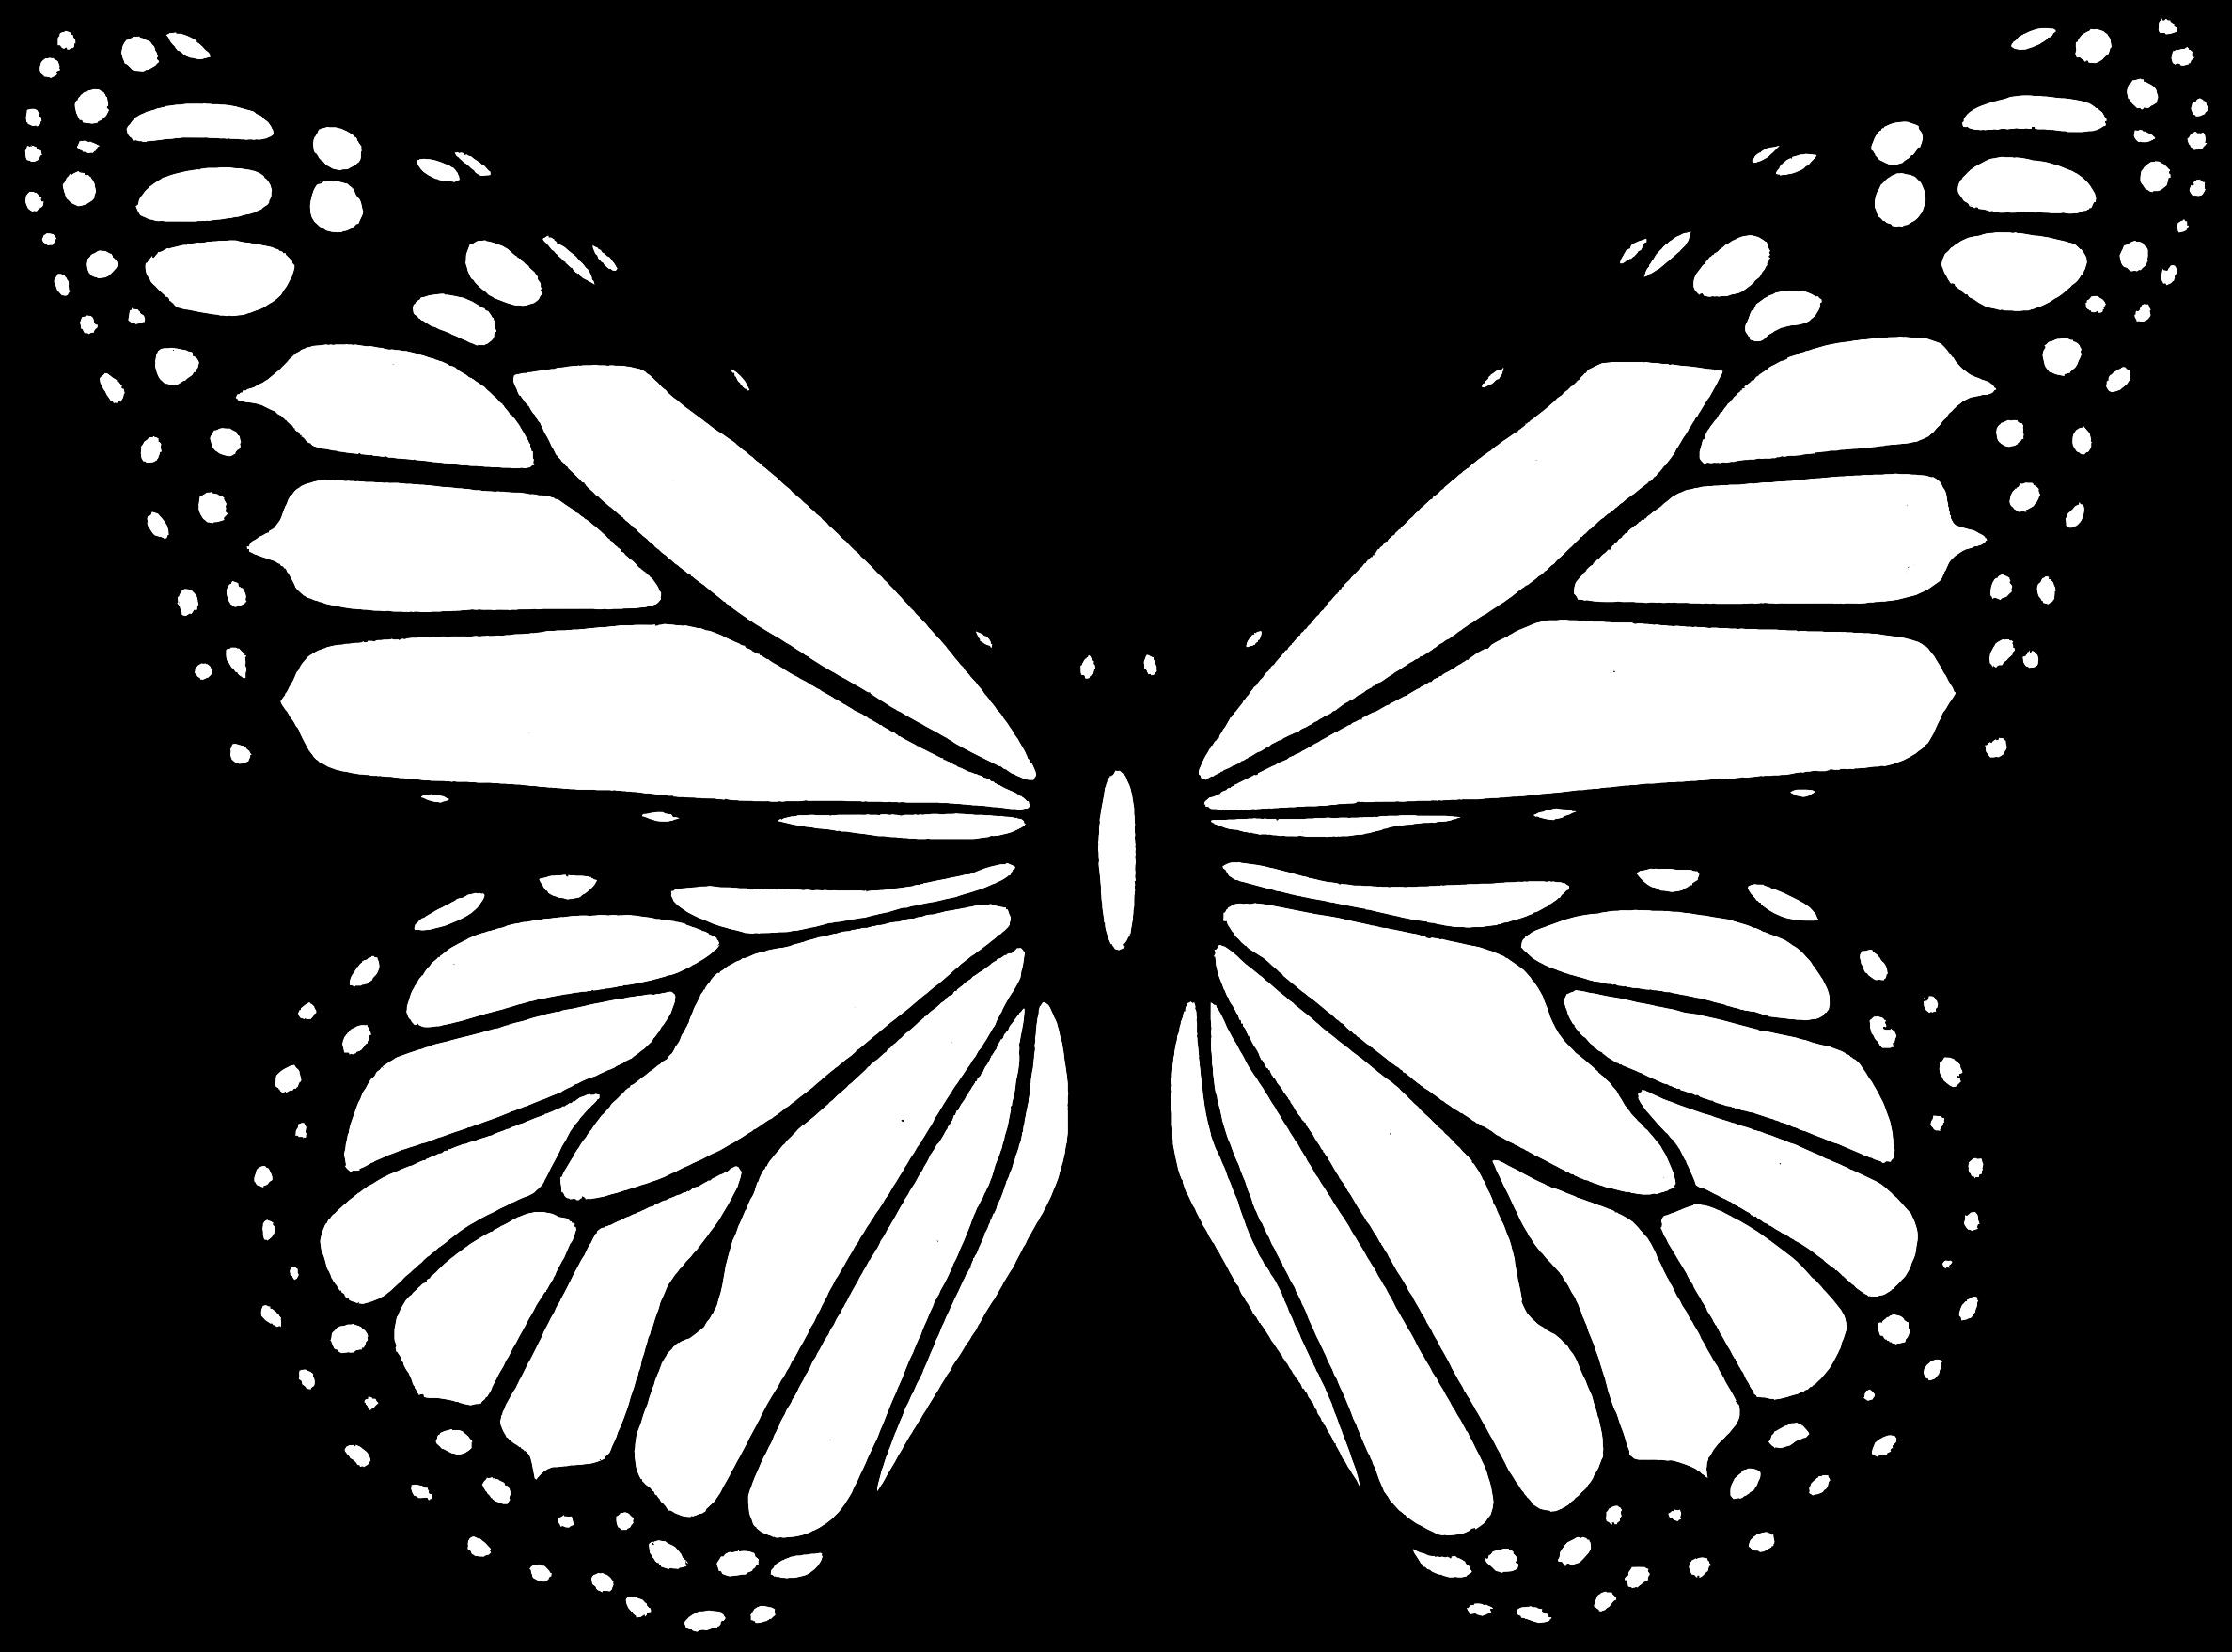 Black And White Butterfly-Black And White Butterfly-1